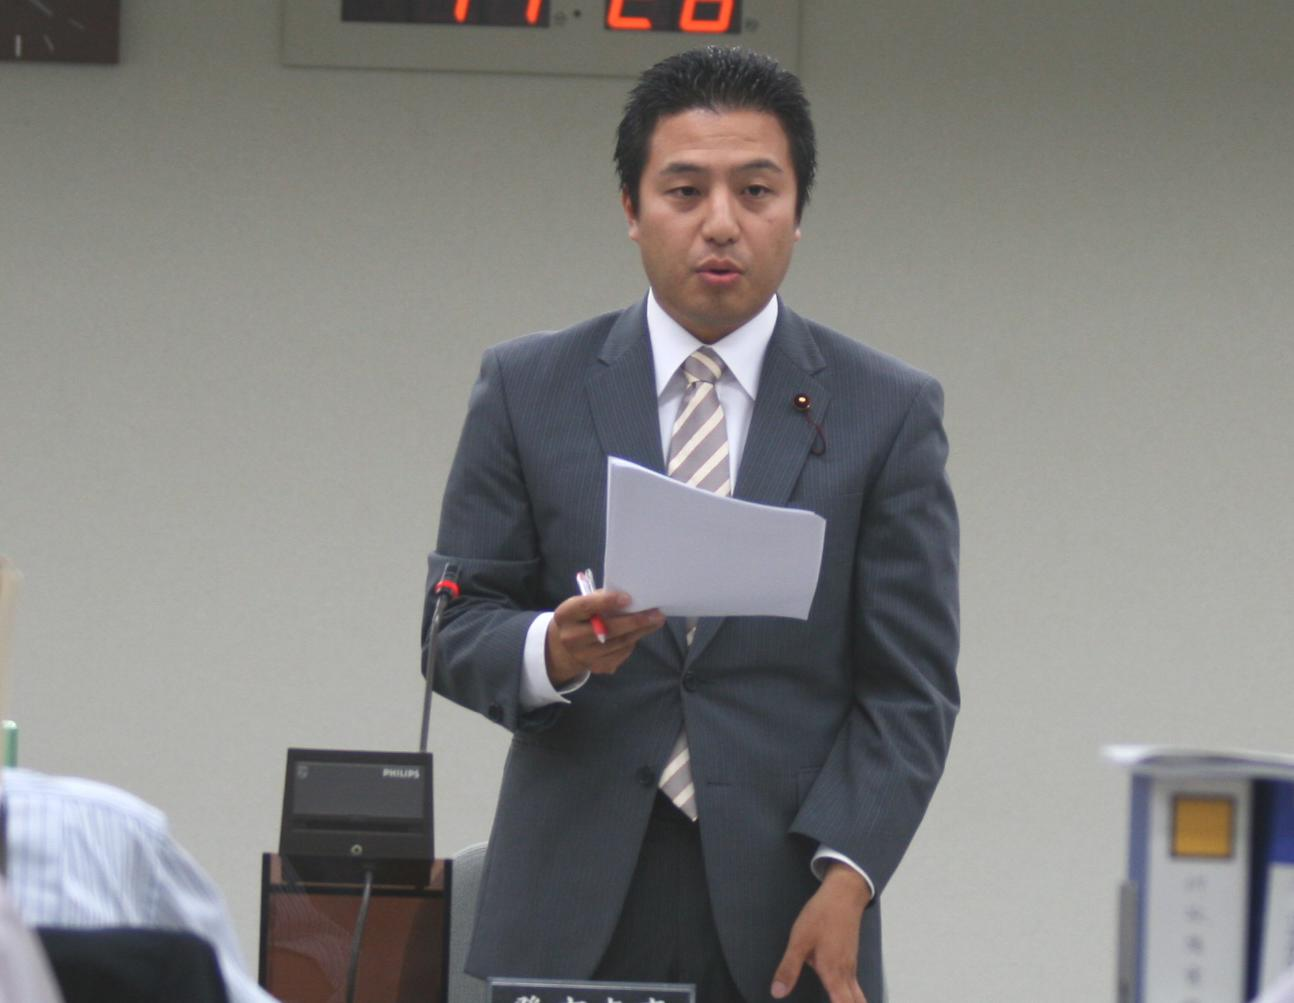 http://yamadakohei.jp/blog_upfile/%E6%B1%BA%E7%AE%972012.JPG